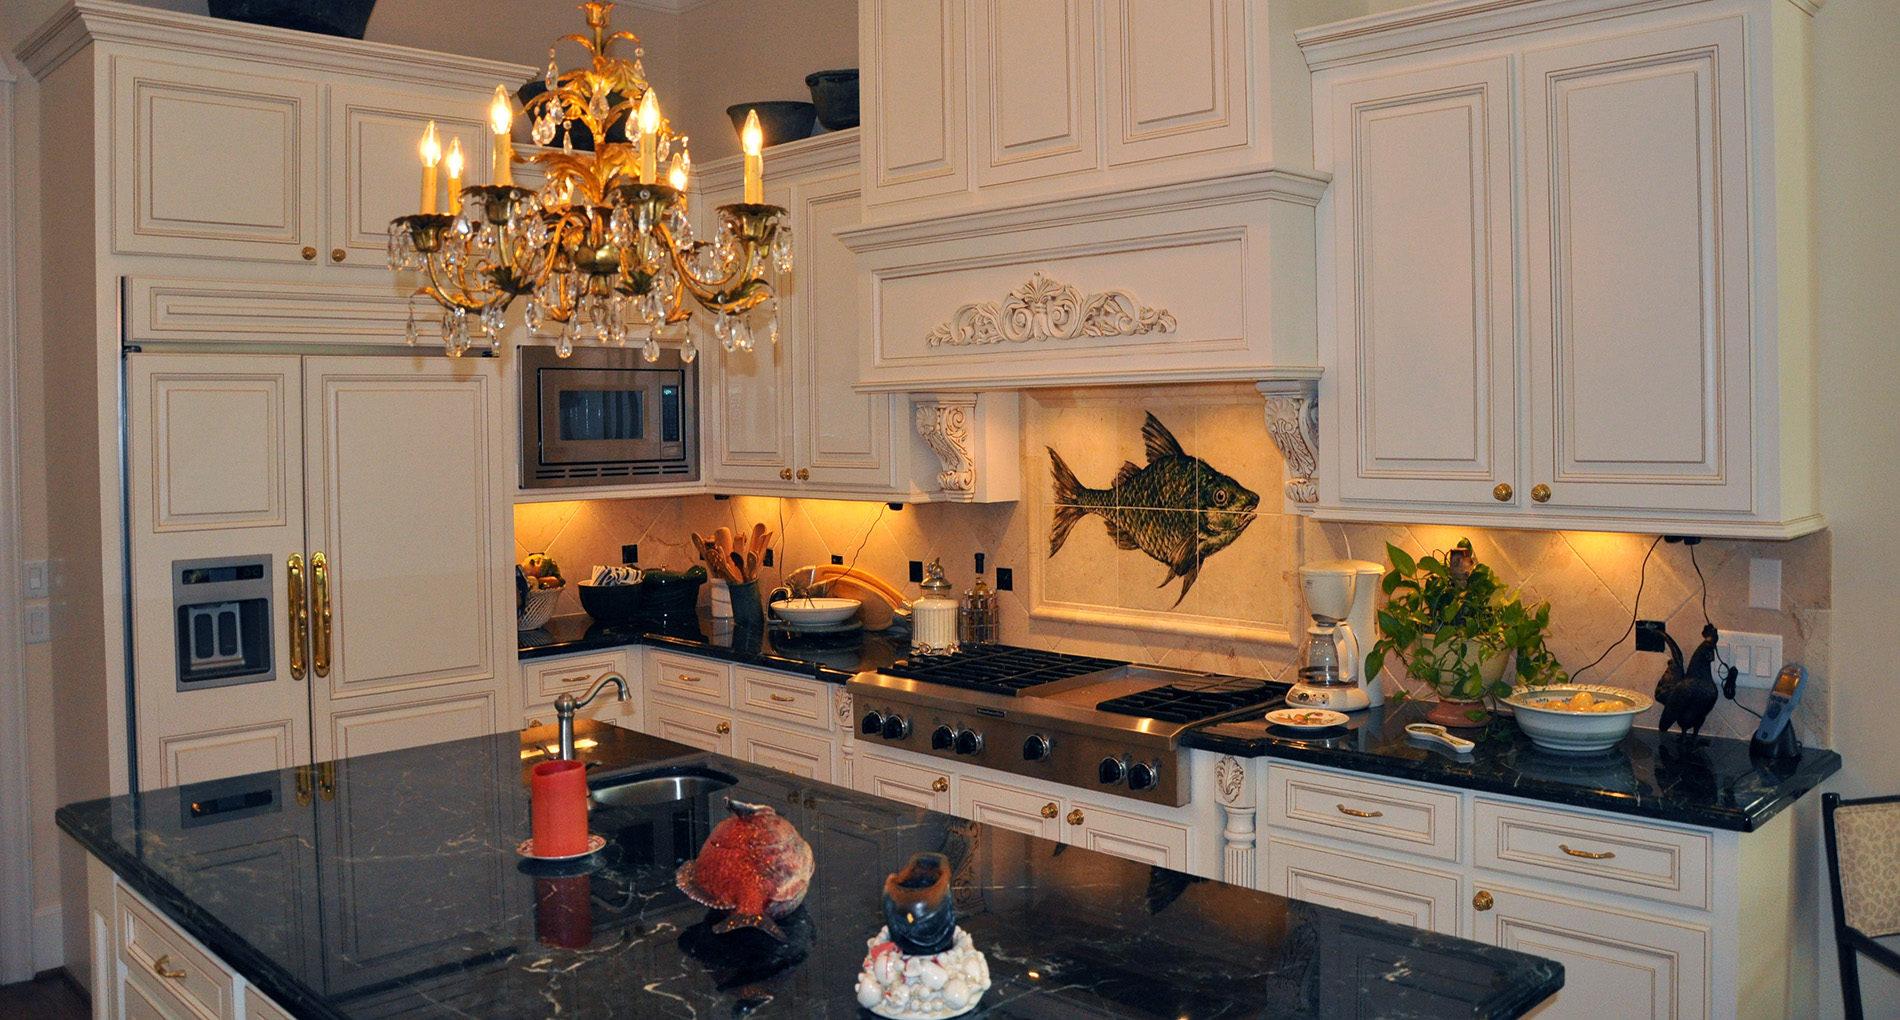 Kitchen Remodel Houston Ecowan Slider